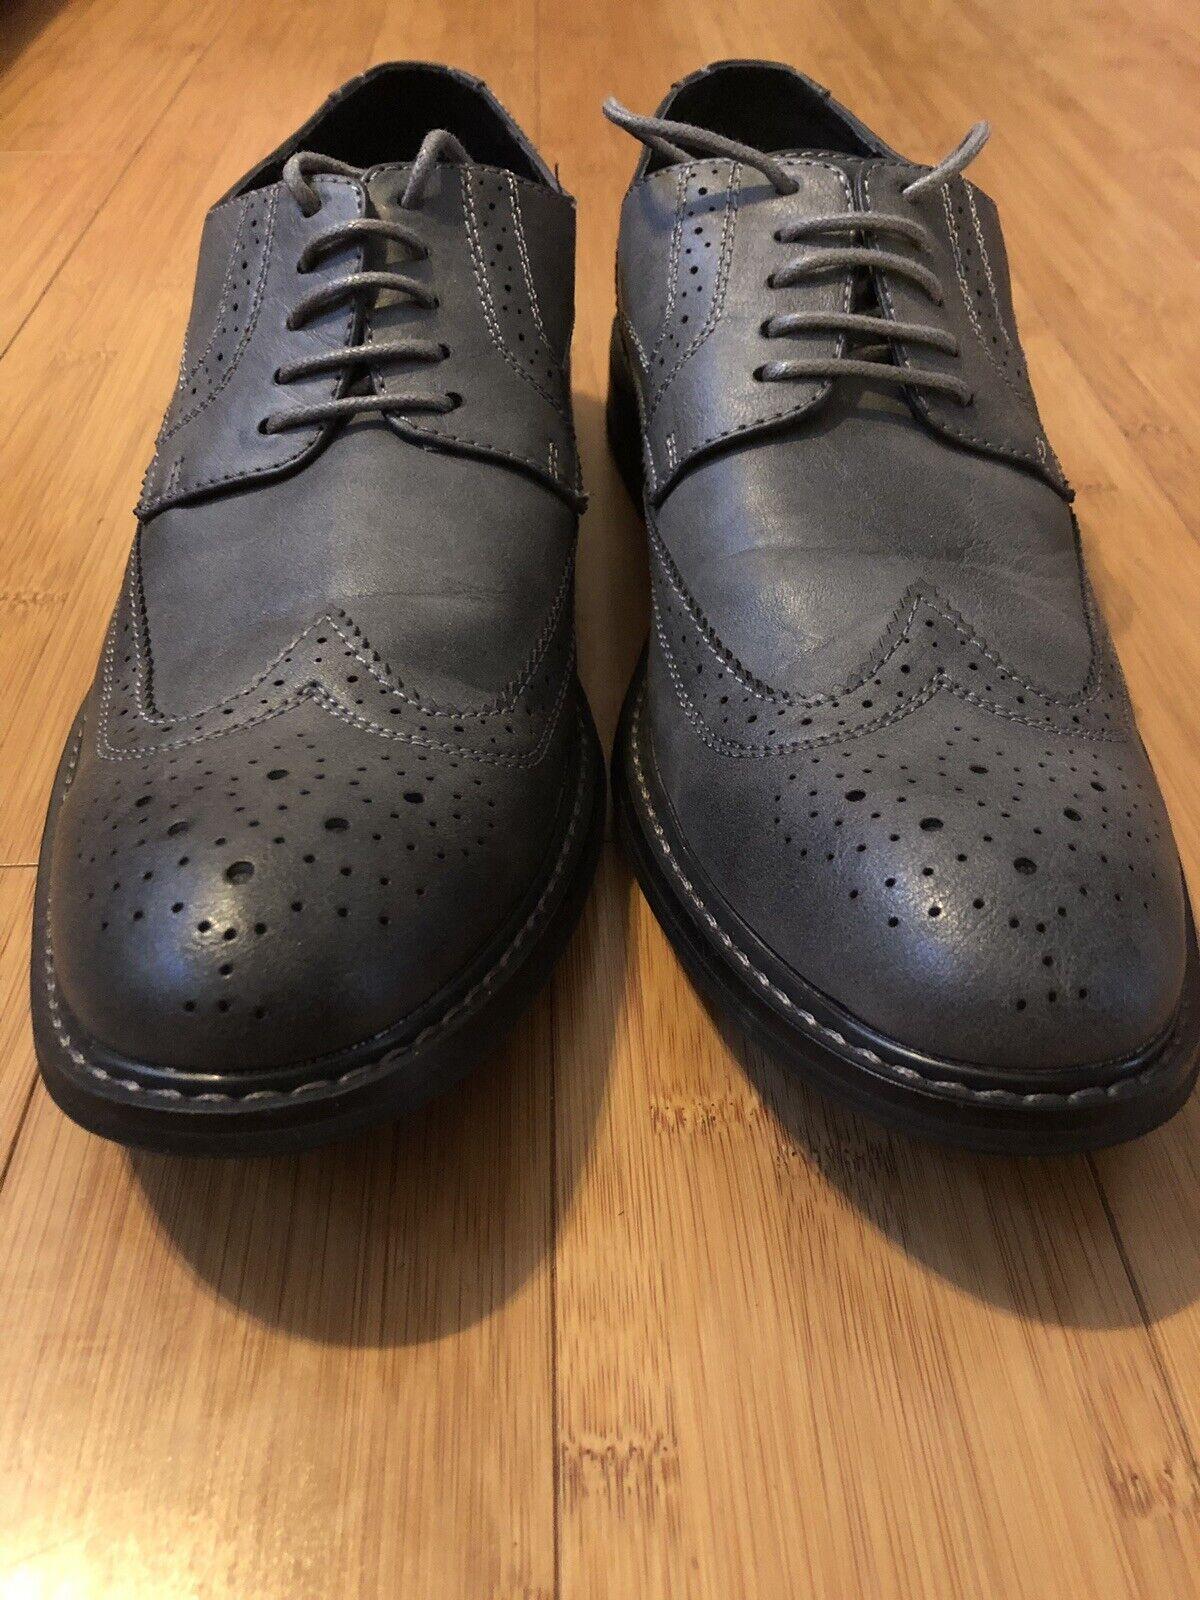 perry ellis portfolio shoes - image 2